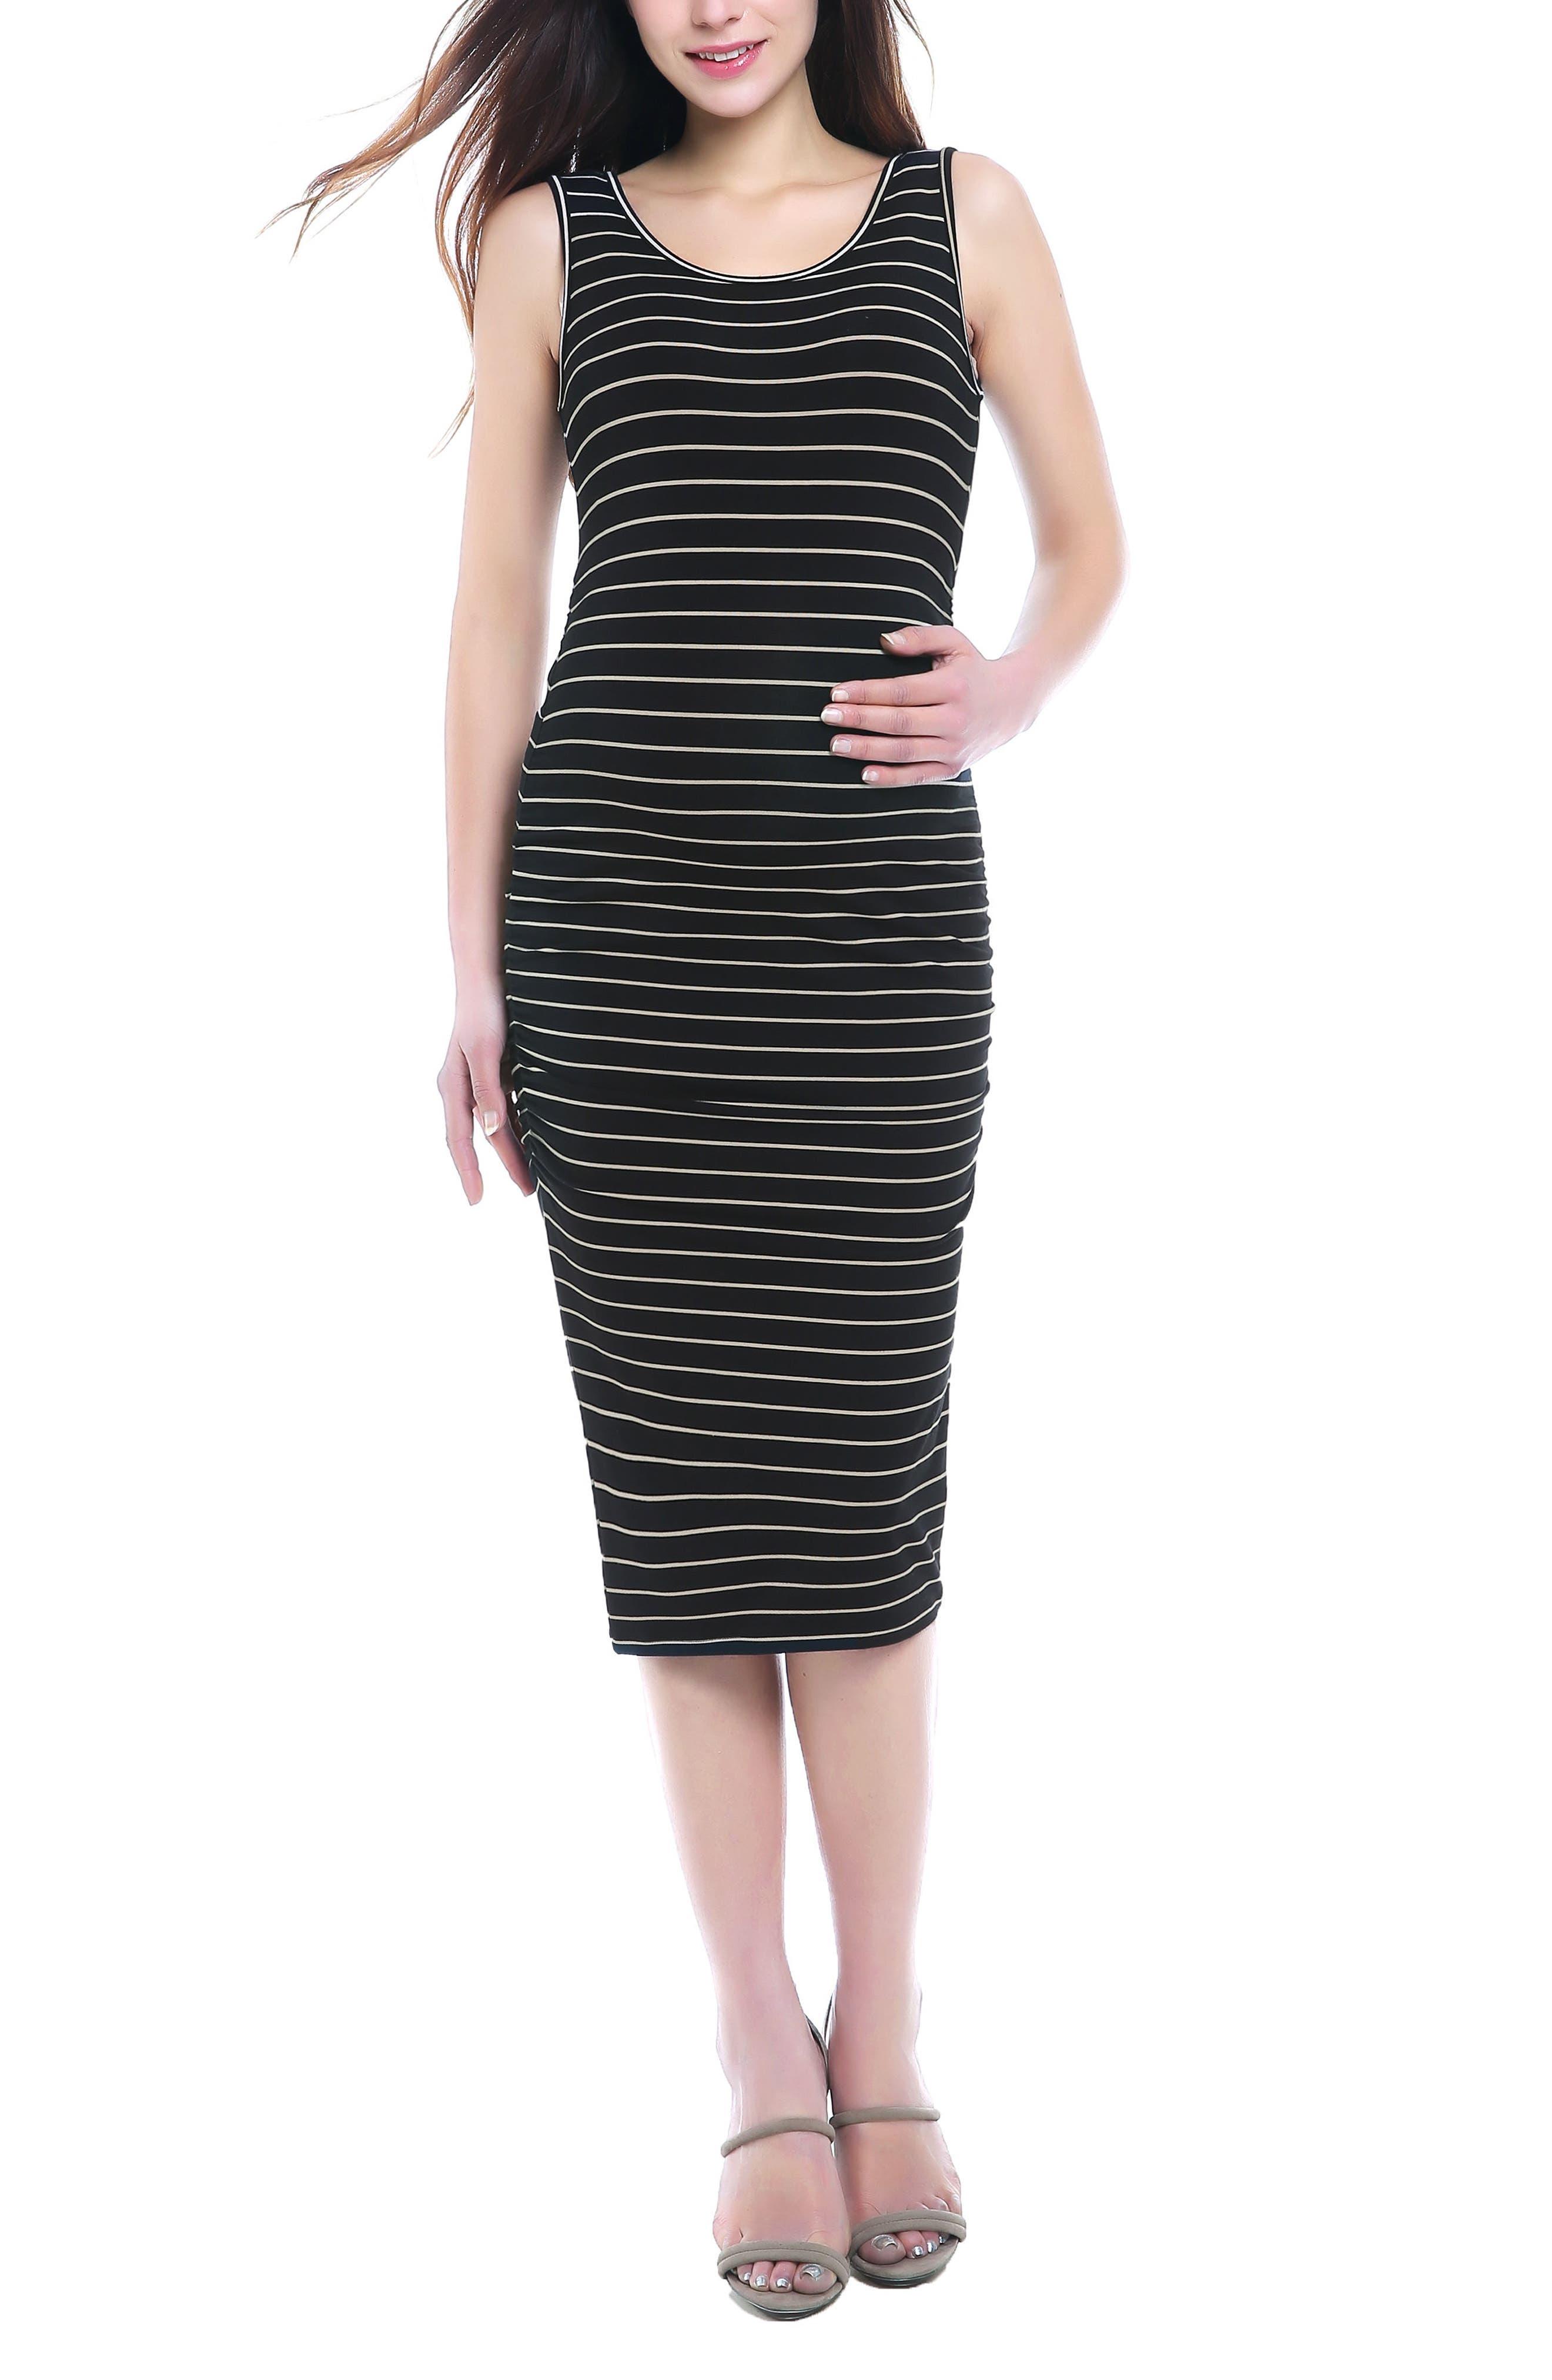 KIMI AND KAI Tobi Stripe Maternity Dress, Main, color, BLACK/ BEIGE